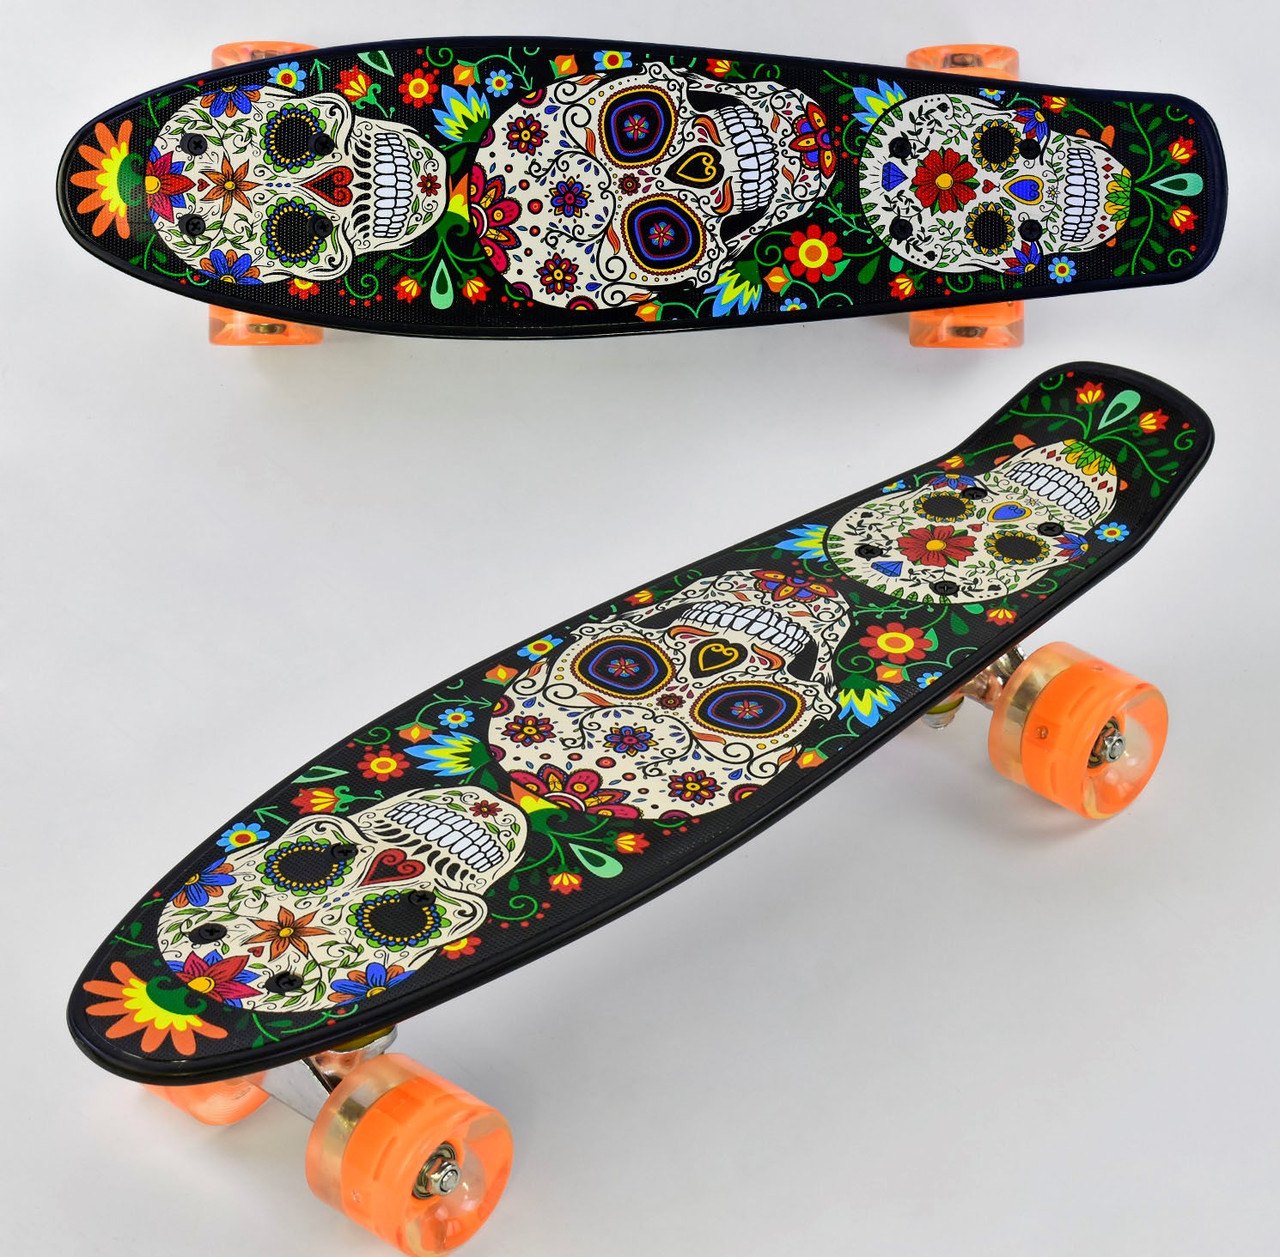 Скейт Penny Board.Скейтборд Best Board.Пенни борд светящийся